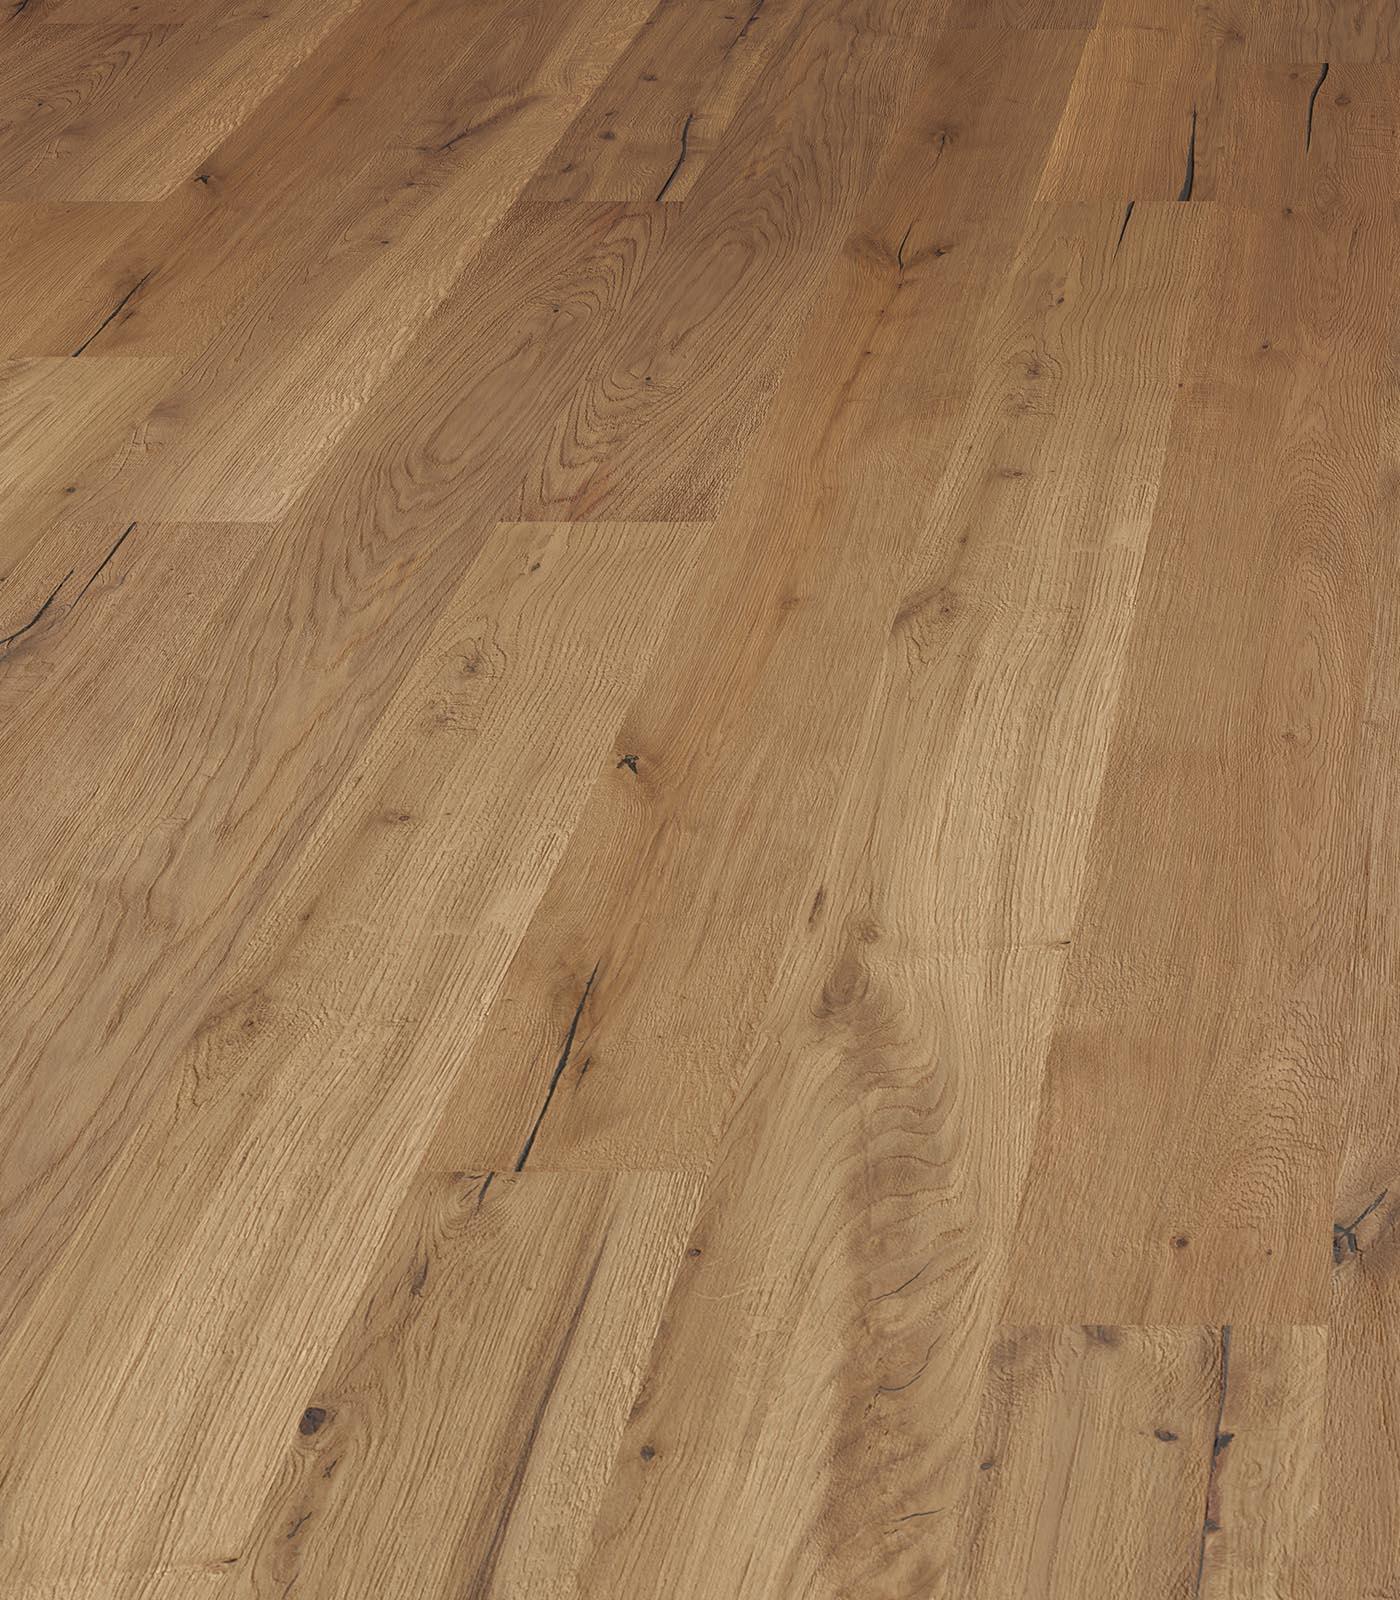 Grampians-Antique Collection-European Oak Floors-angle